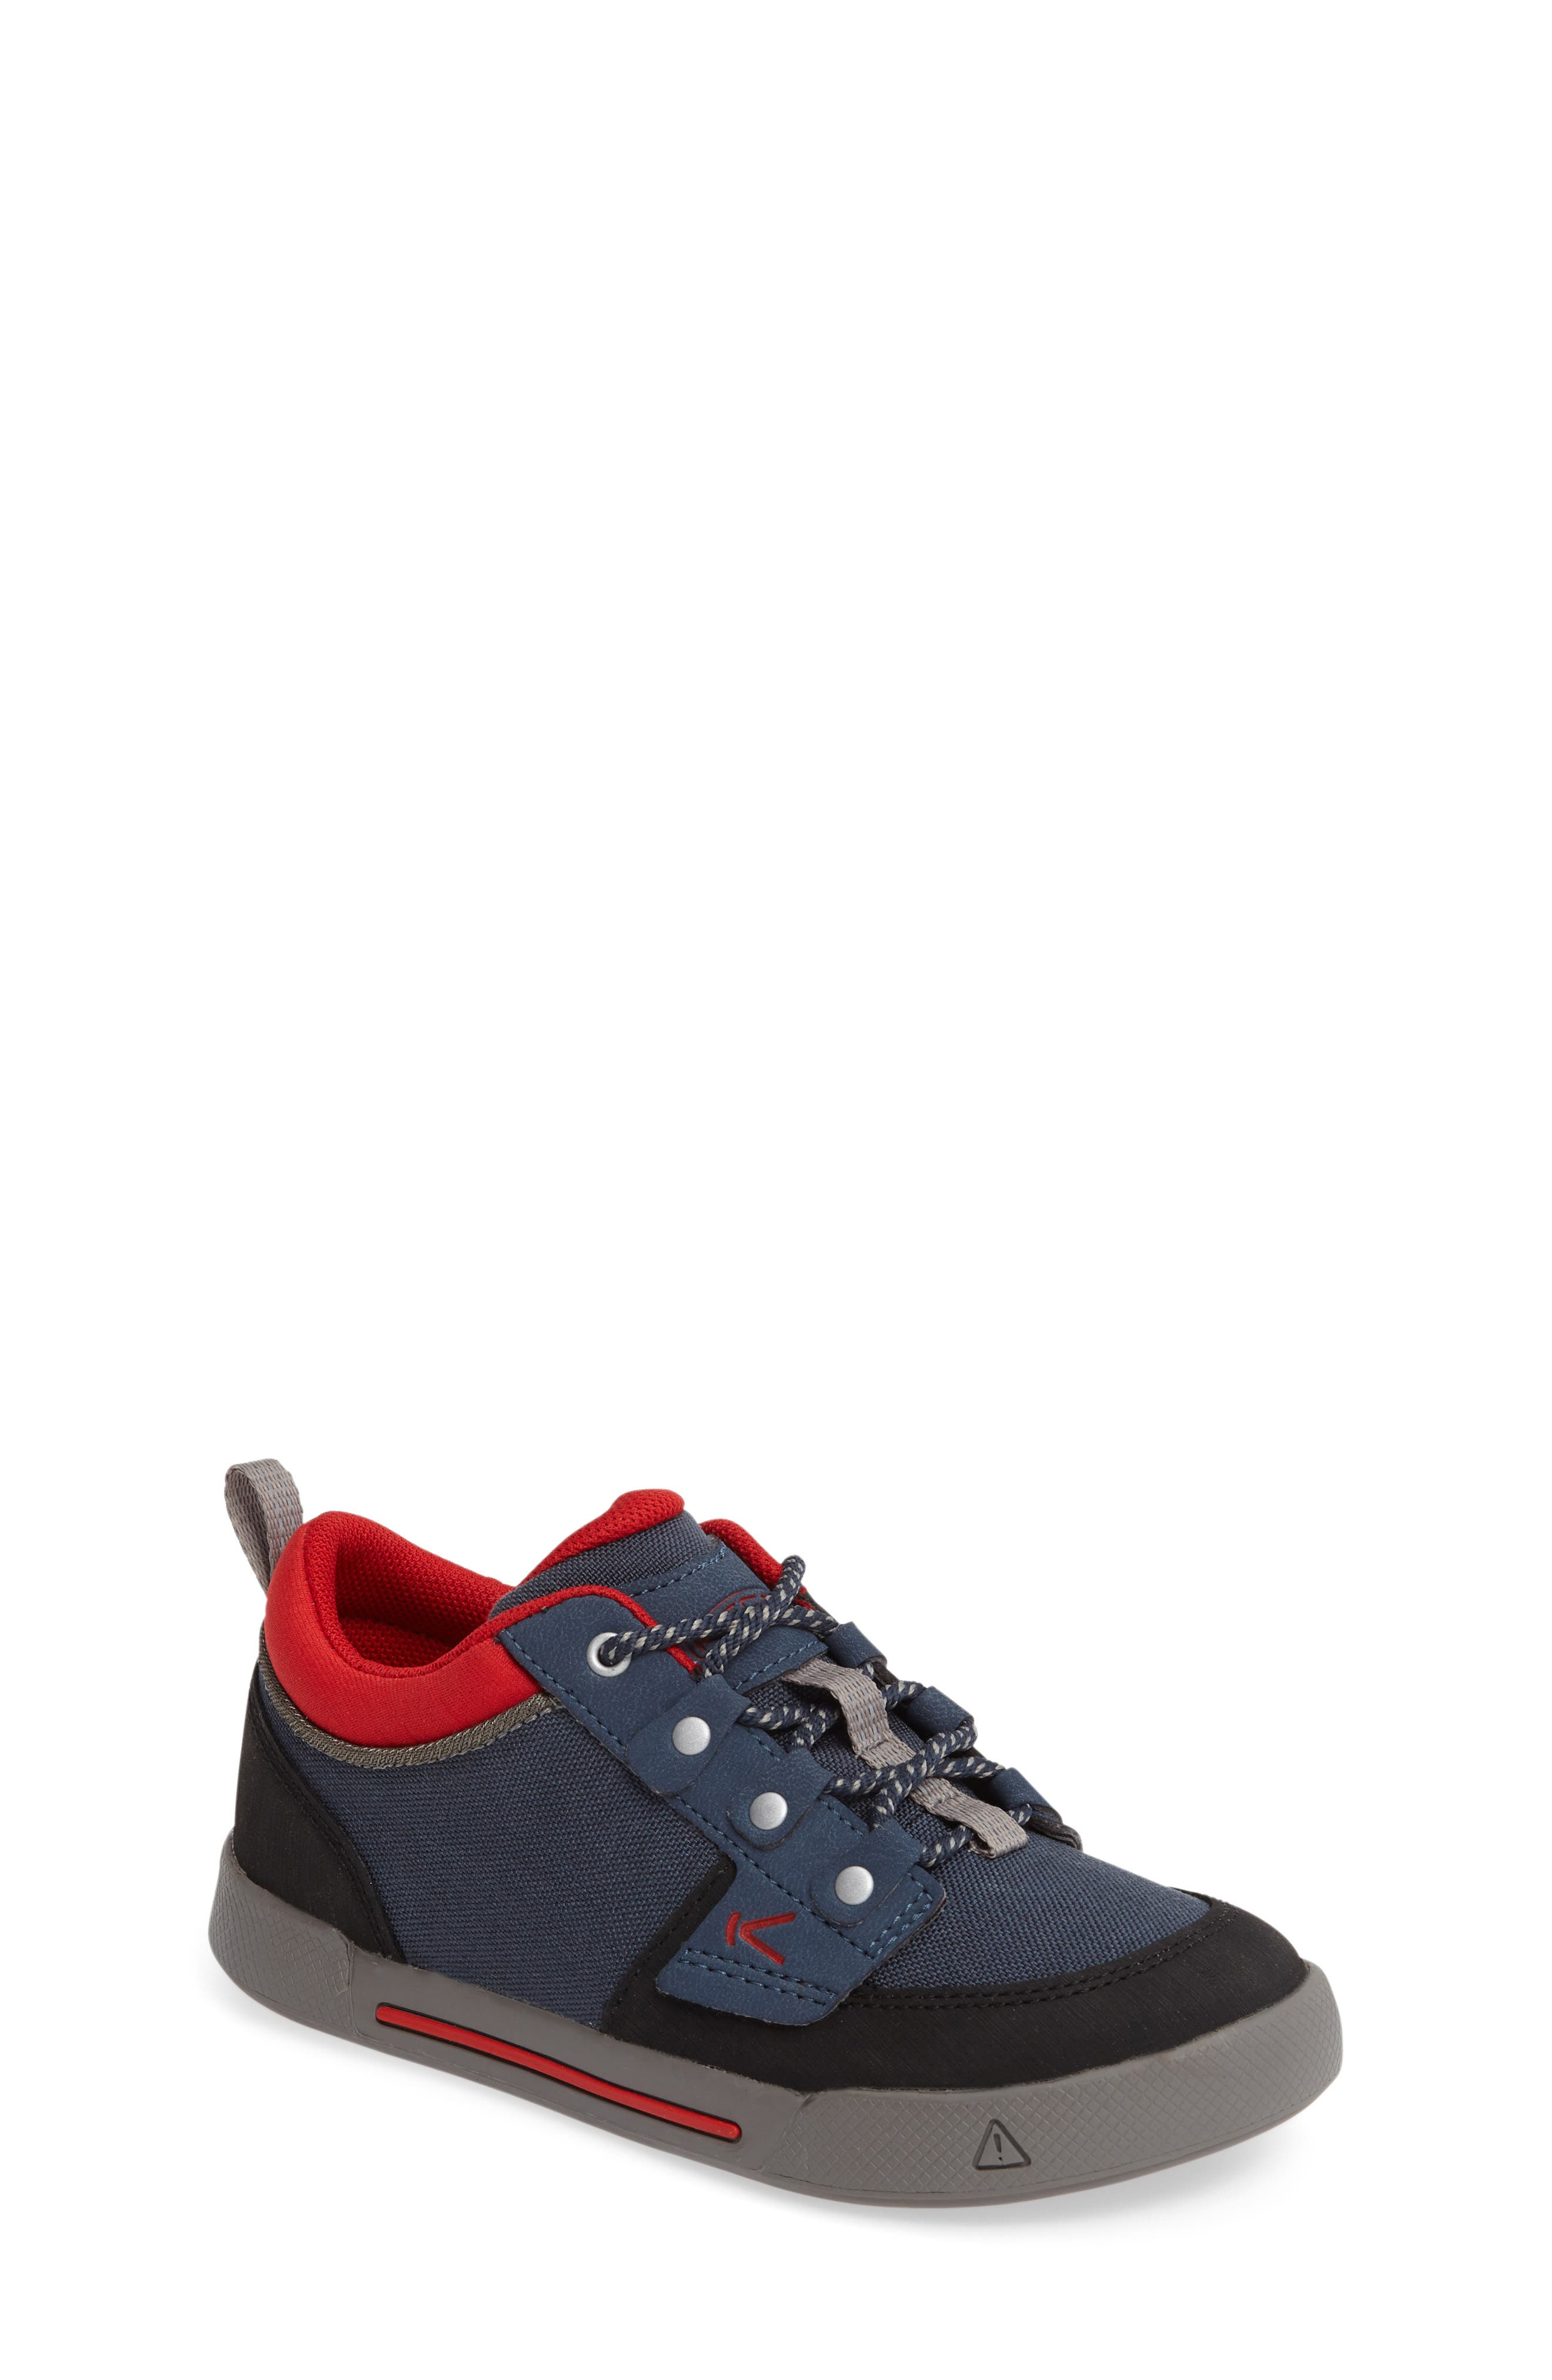 Encanto Wesley Sneaker,                             Main thumbnail 1, color,                             Midnight Navy/ Formula One